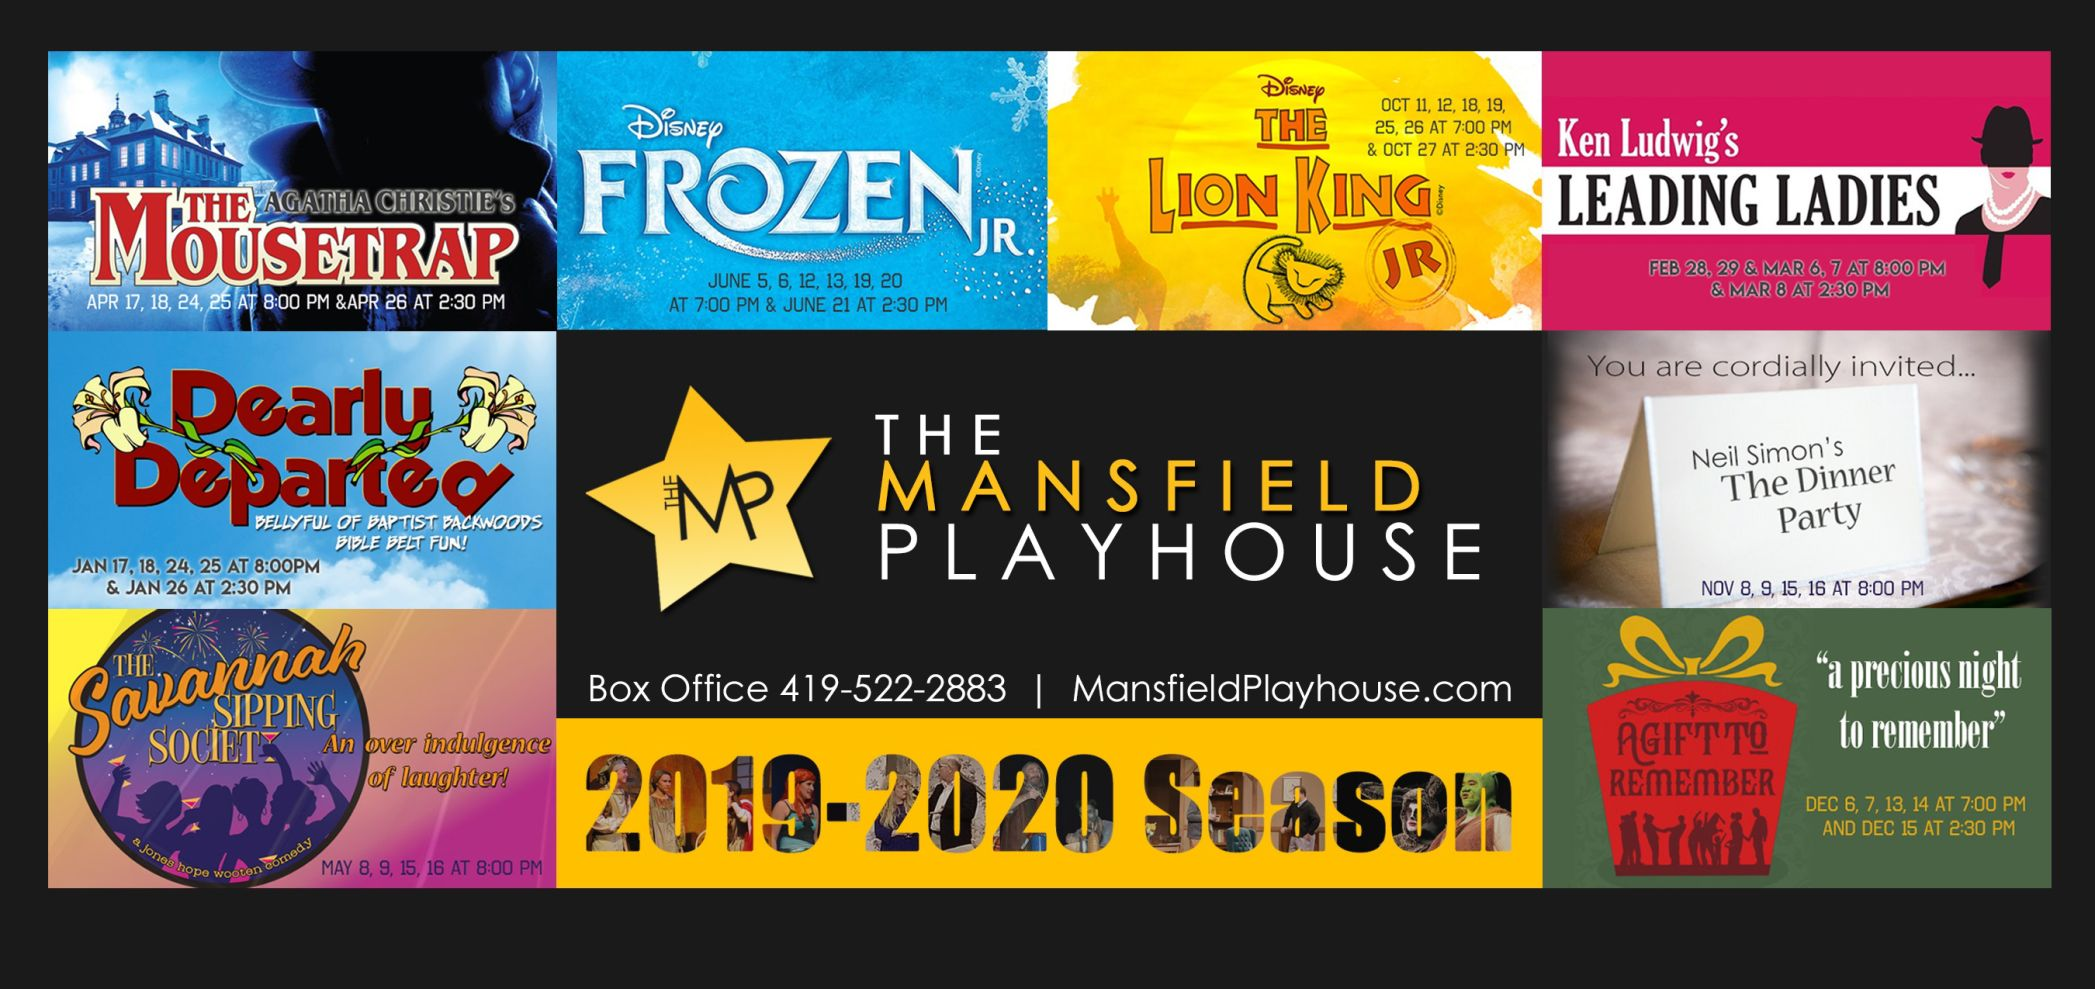 Lion King Jr. replaces Frozen Jr. in Mansfield Playhouse 2019-20 schedule